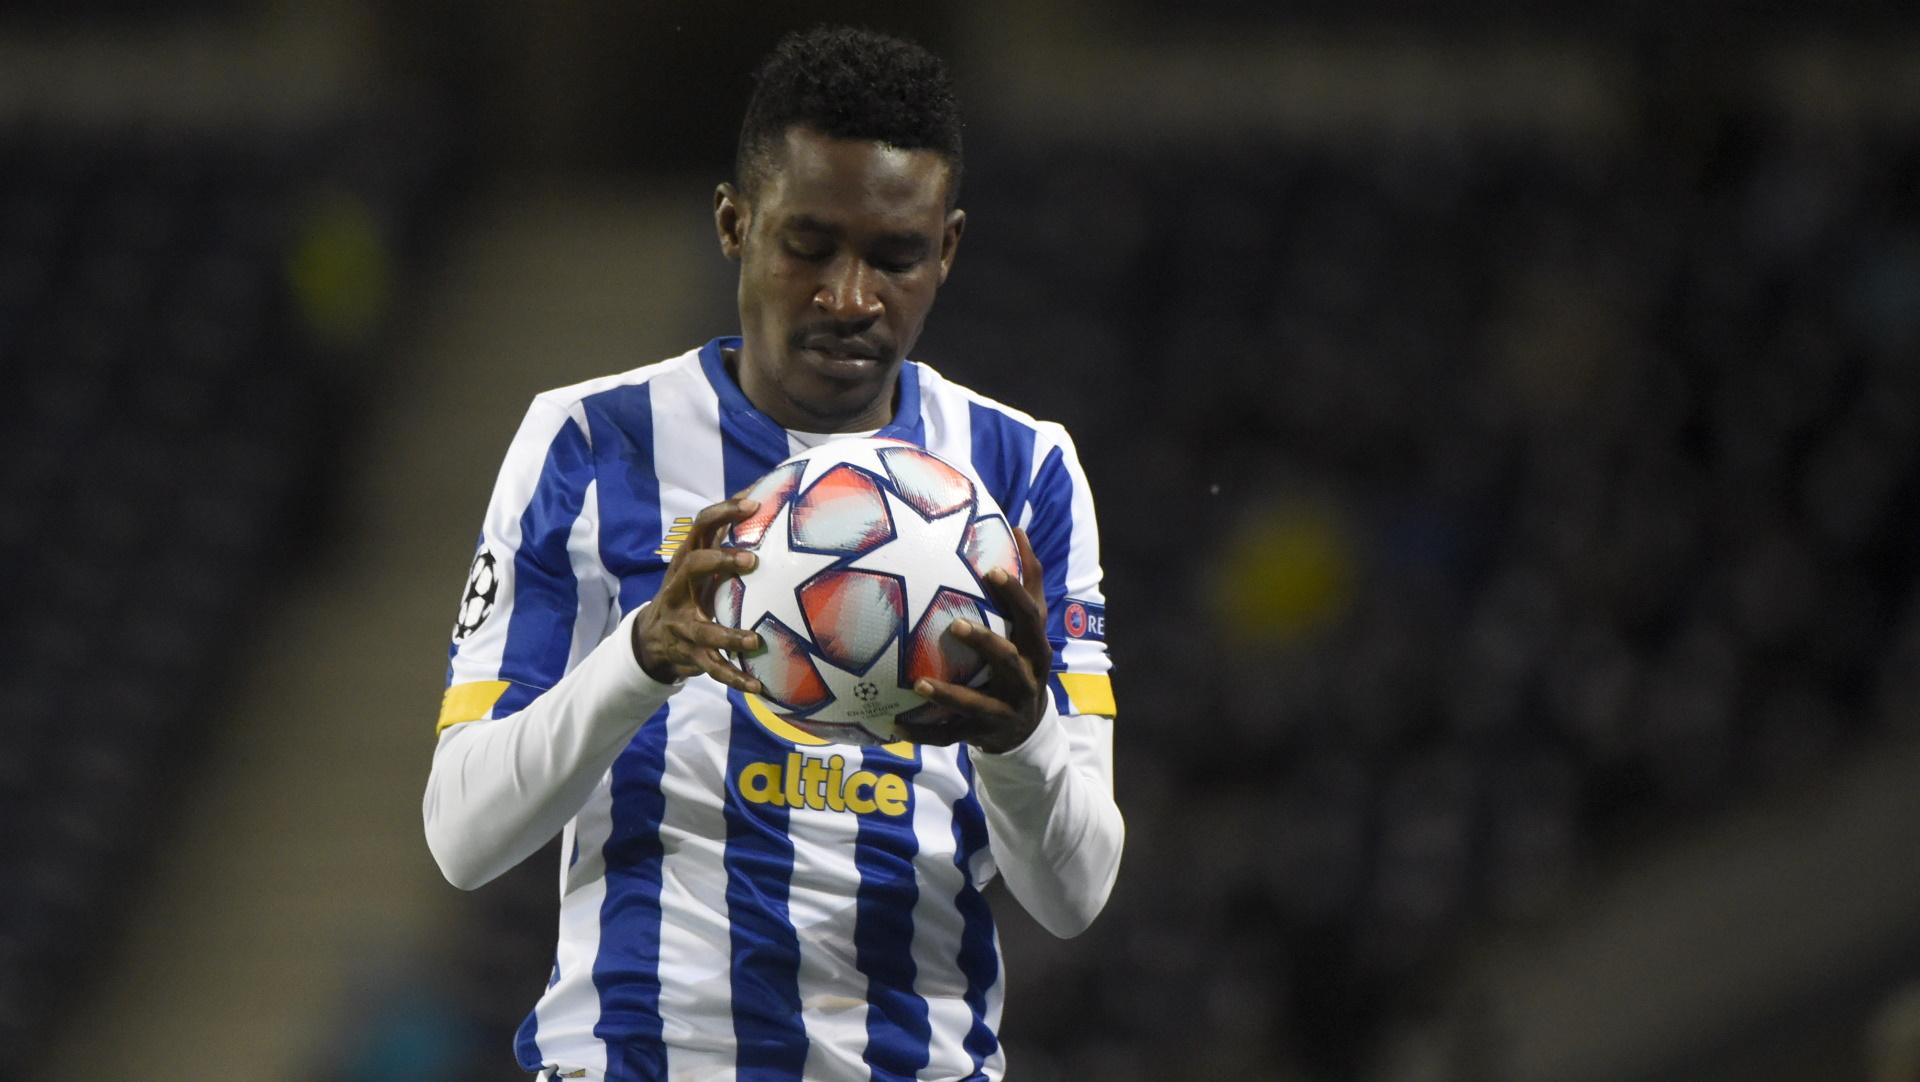 Could Zaidu Sanusi be Africa's breakout star of 2020?   Goal.com